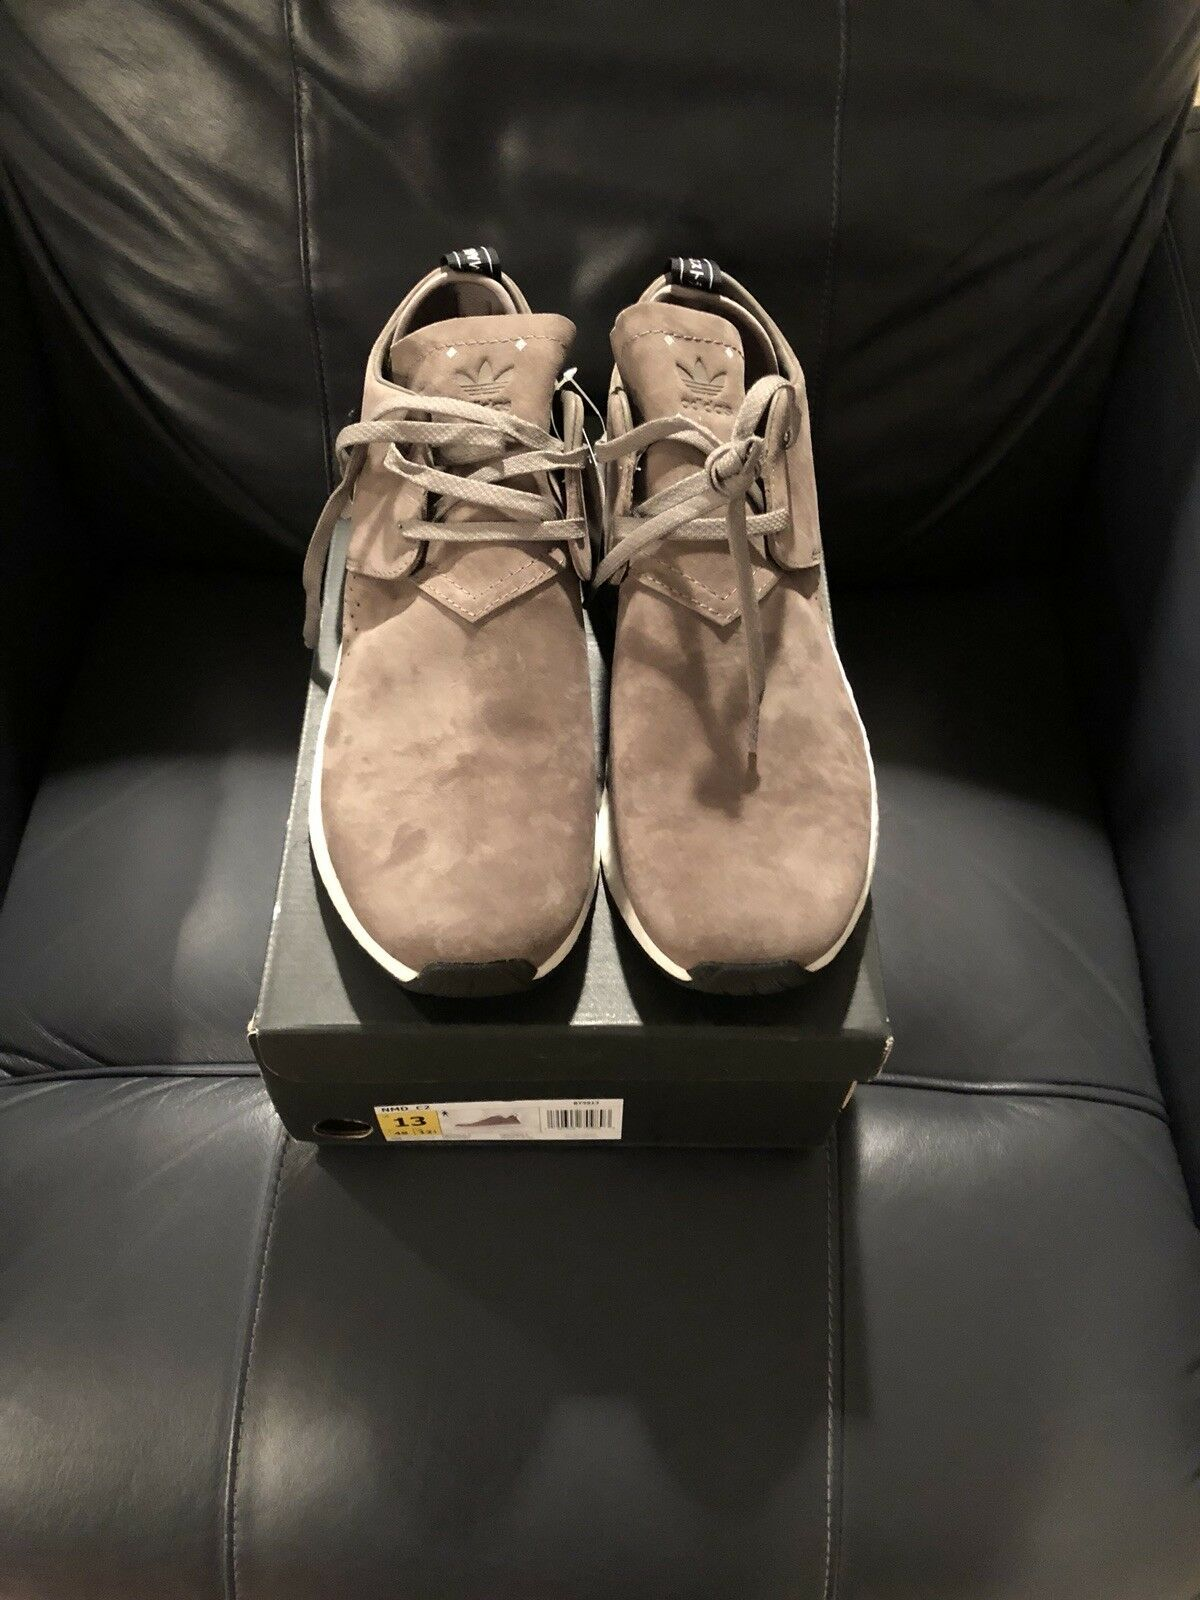 4341d9b12e5dd Man Woman  Adidas NMD NMD NMD C2 13  Shopkeeper 0e408b - work ...